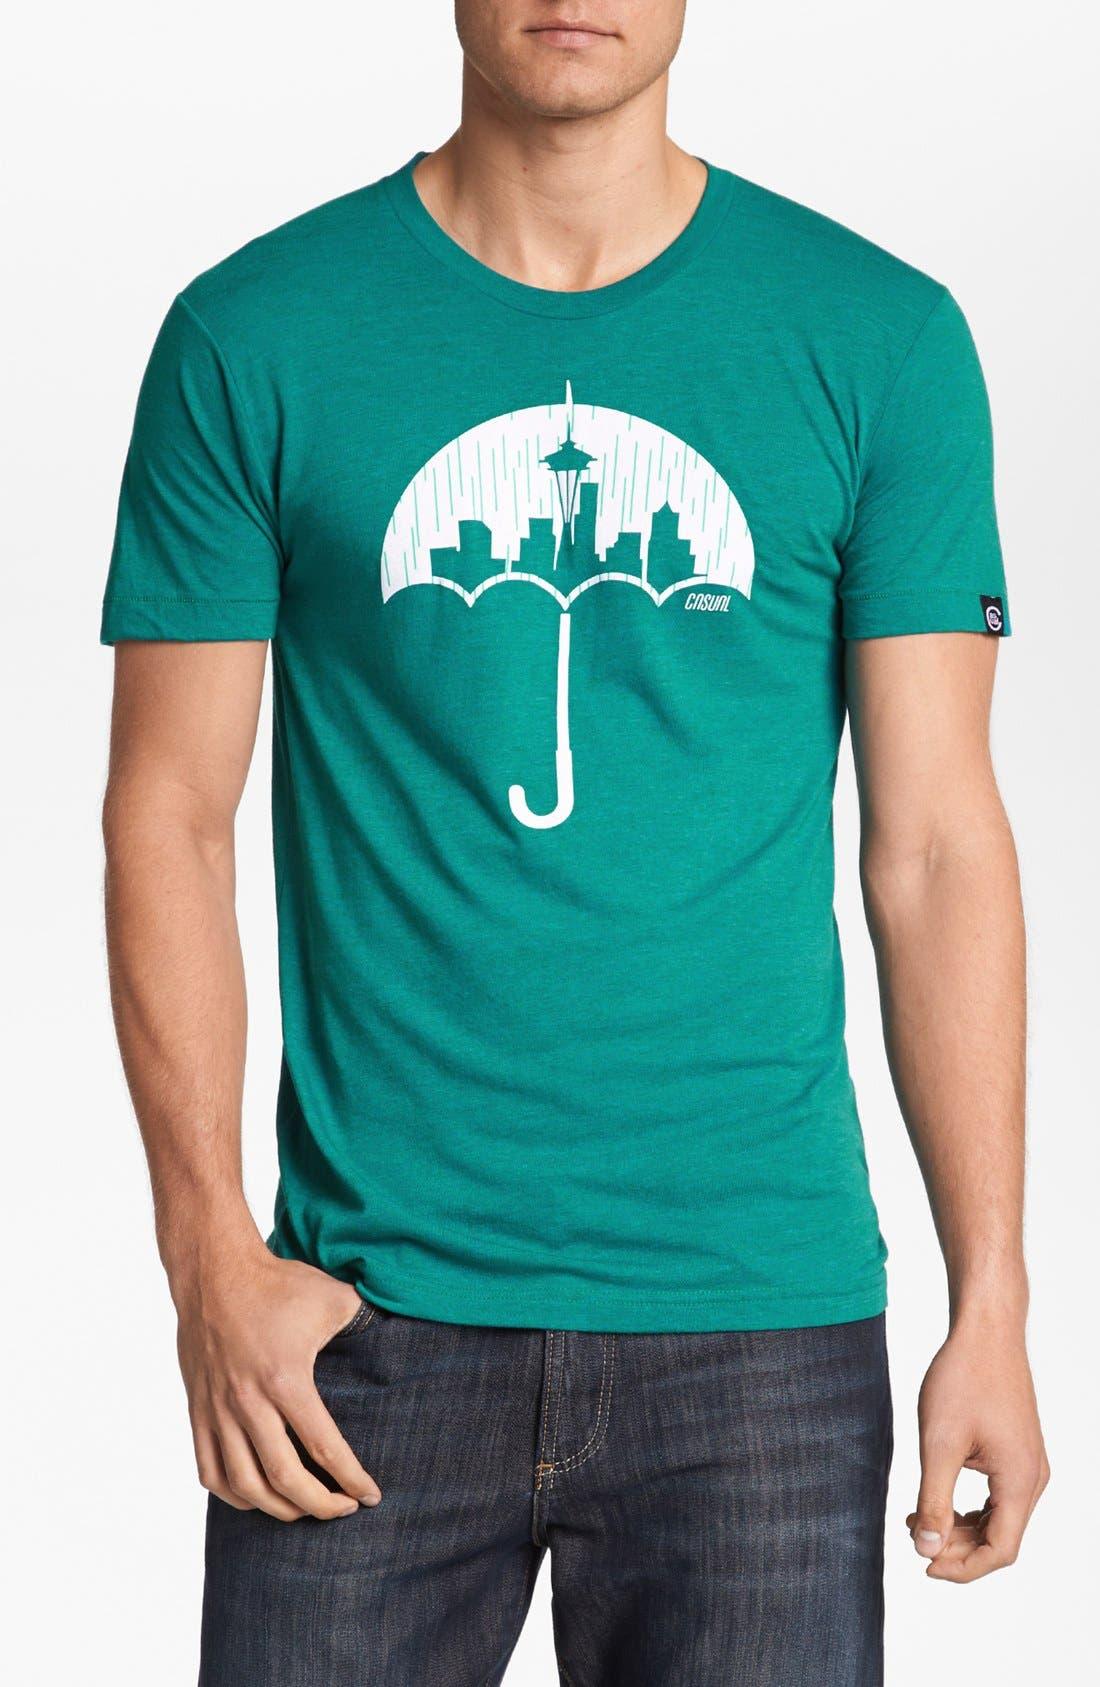 Alternate Image 1 Selected - Casual Industrees 'Umbrella Rain' Graphic T-Shirt